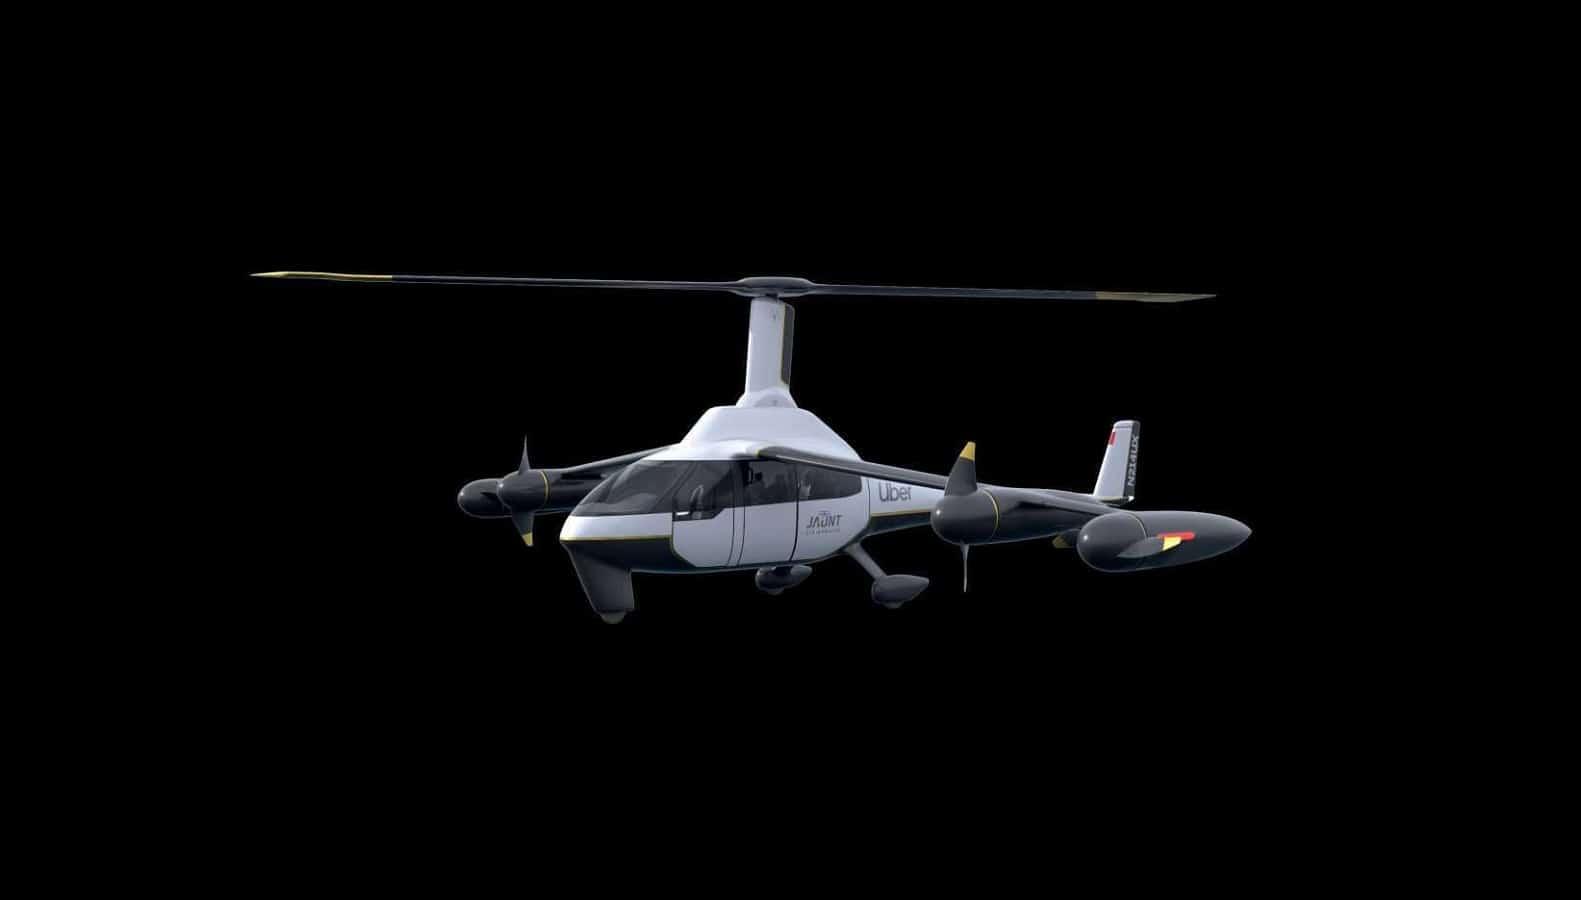 uber drone on black background